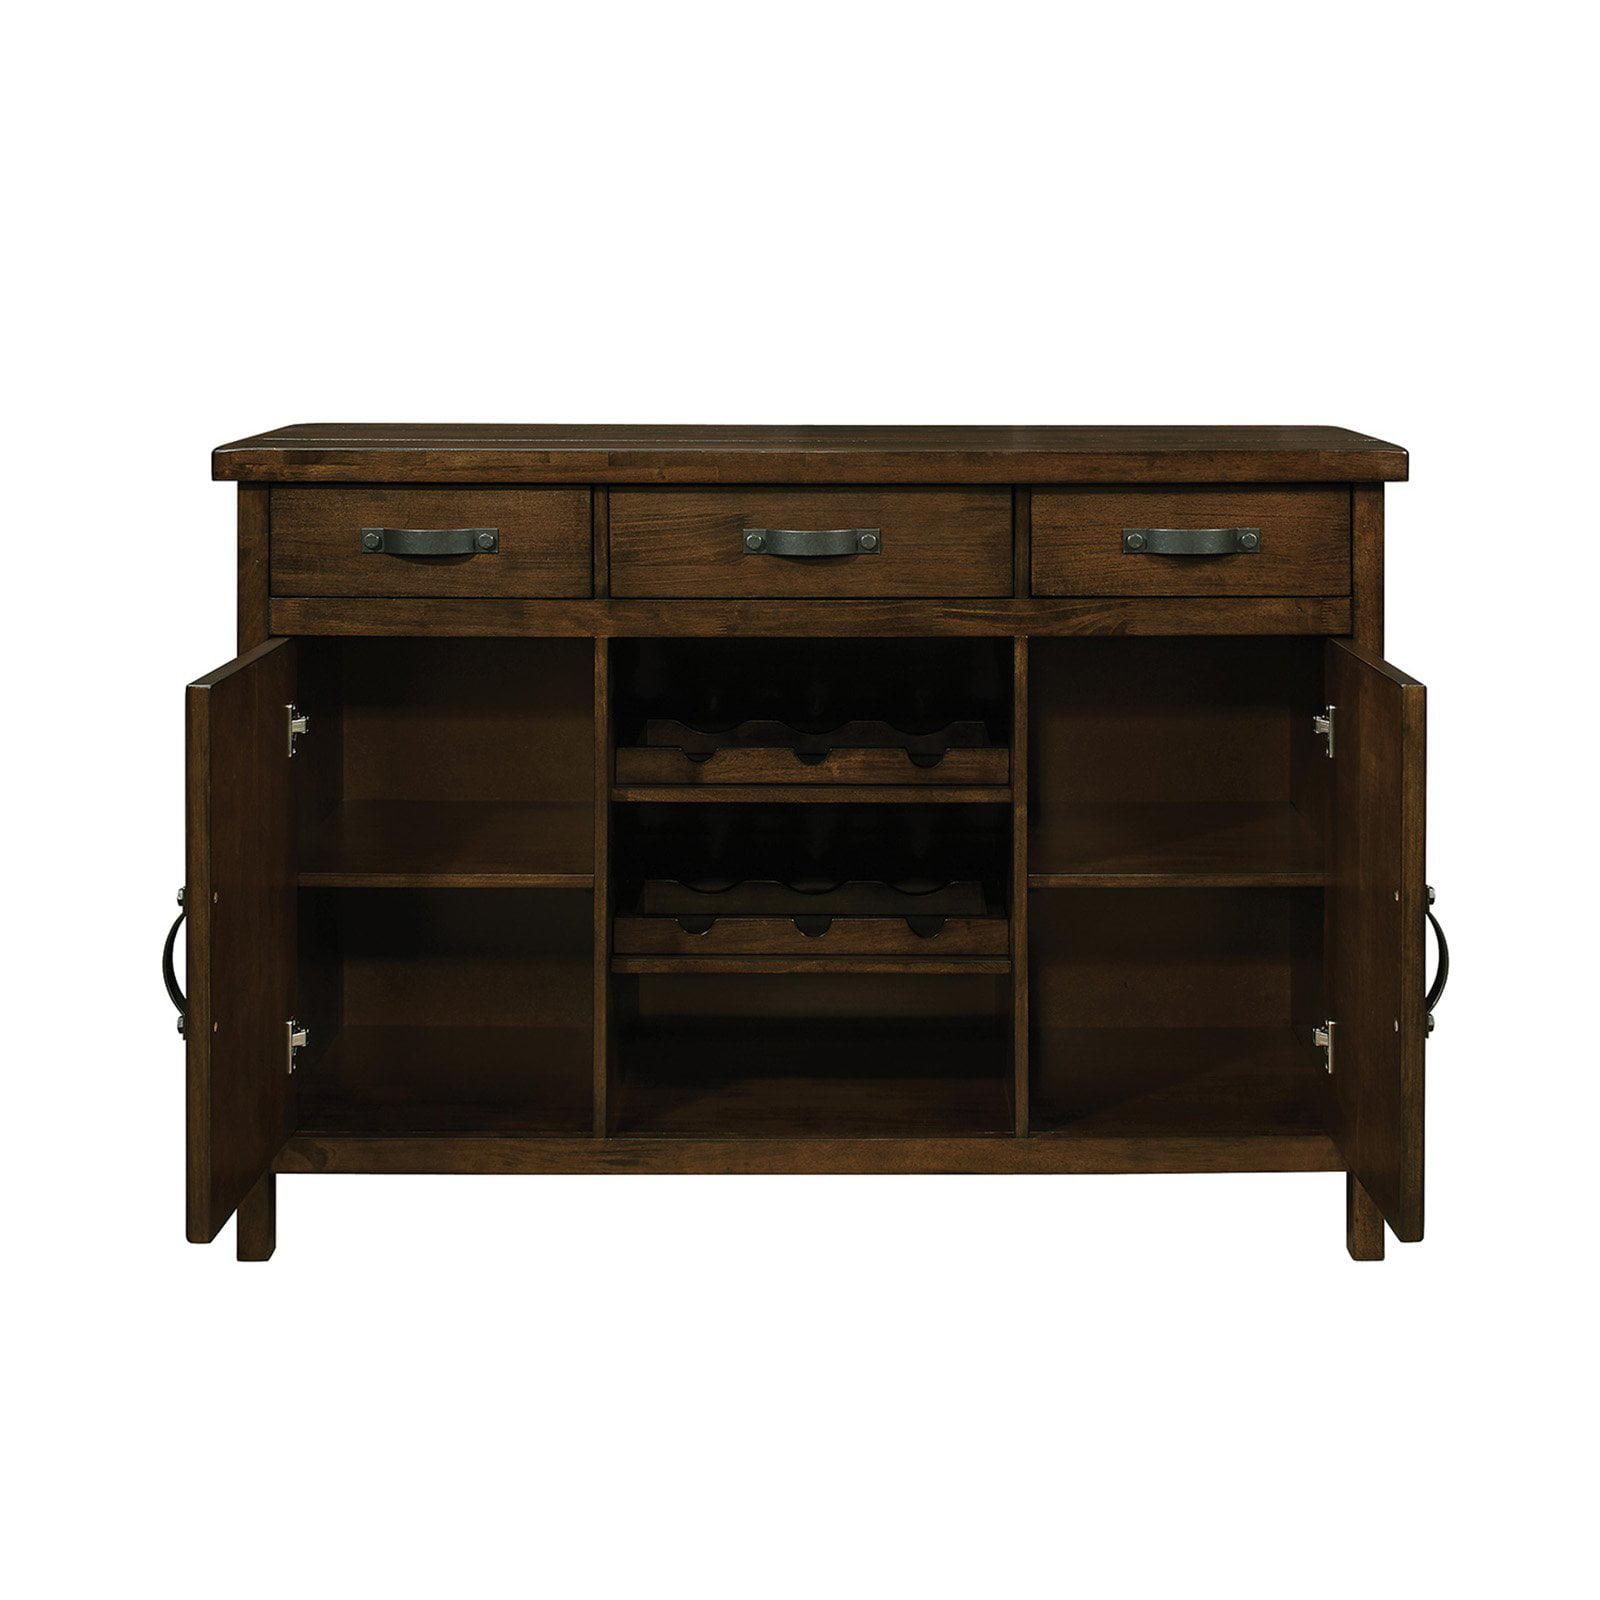 Coaster Furniture Wiltshire Rustic Pecan Server by Coaster - Brown